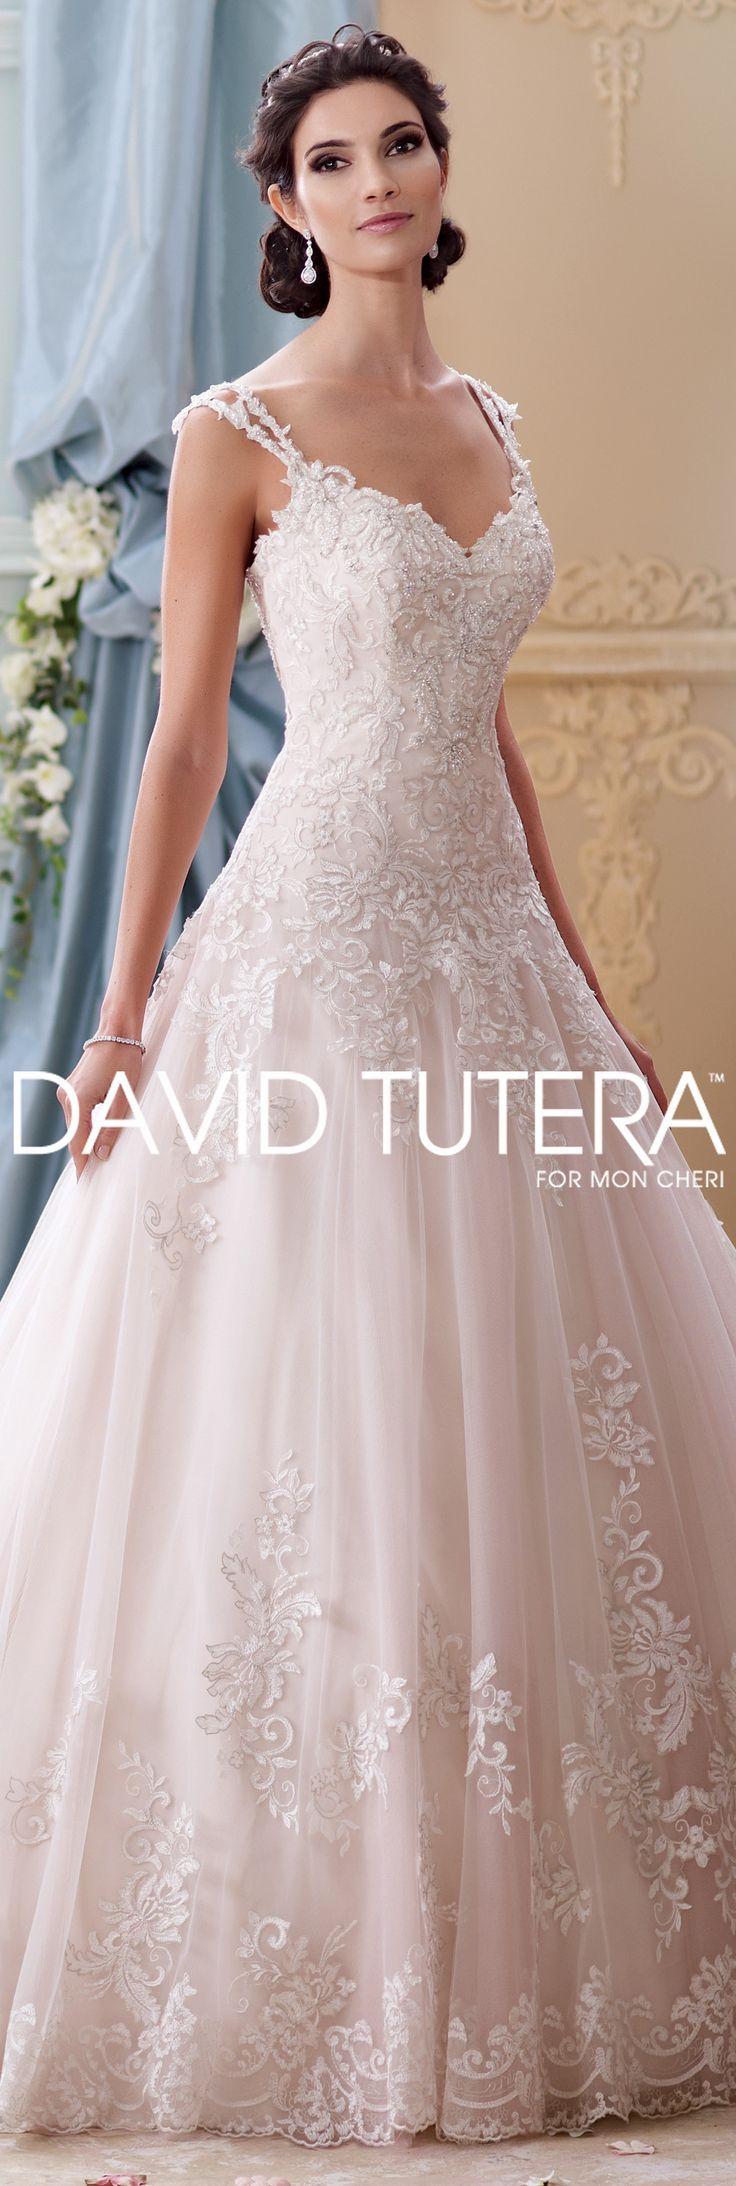 The David Tutera for Mon Cheri Fall 2015 Wedding Gown Collection - Style No. 215277 Arwen  #laceweddingdresses